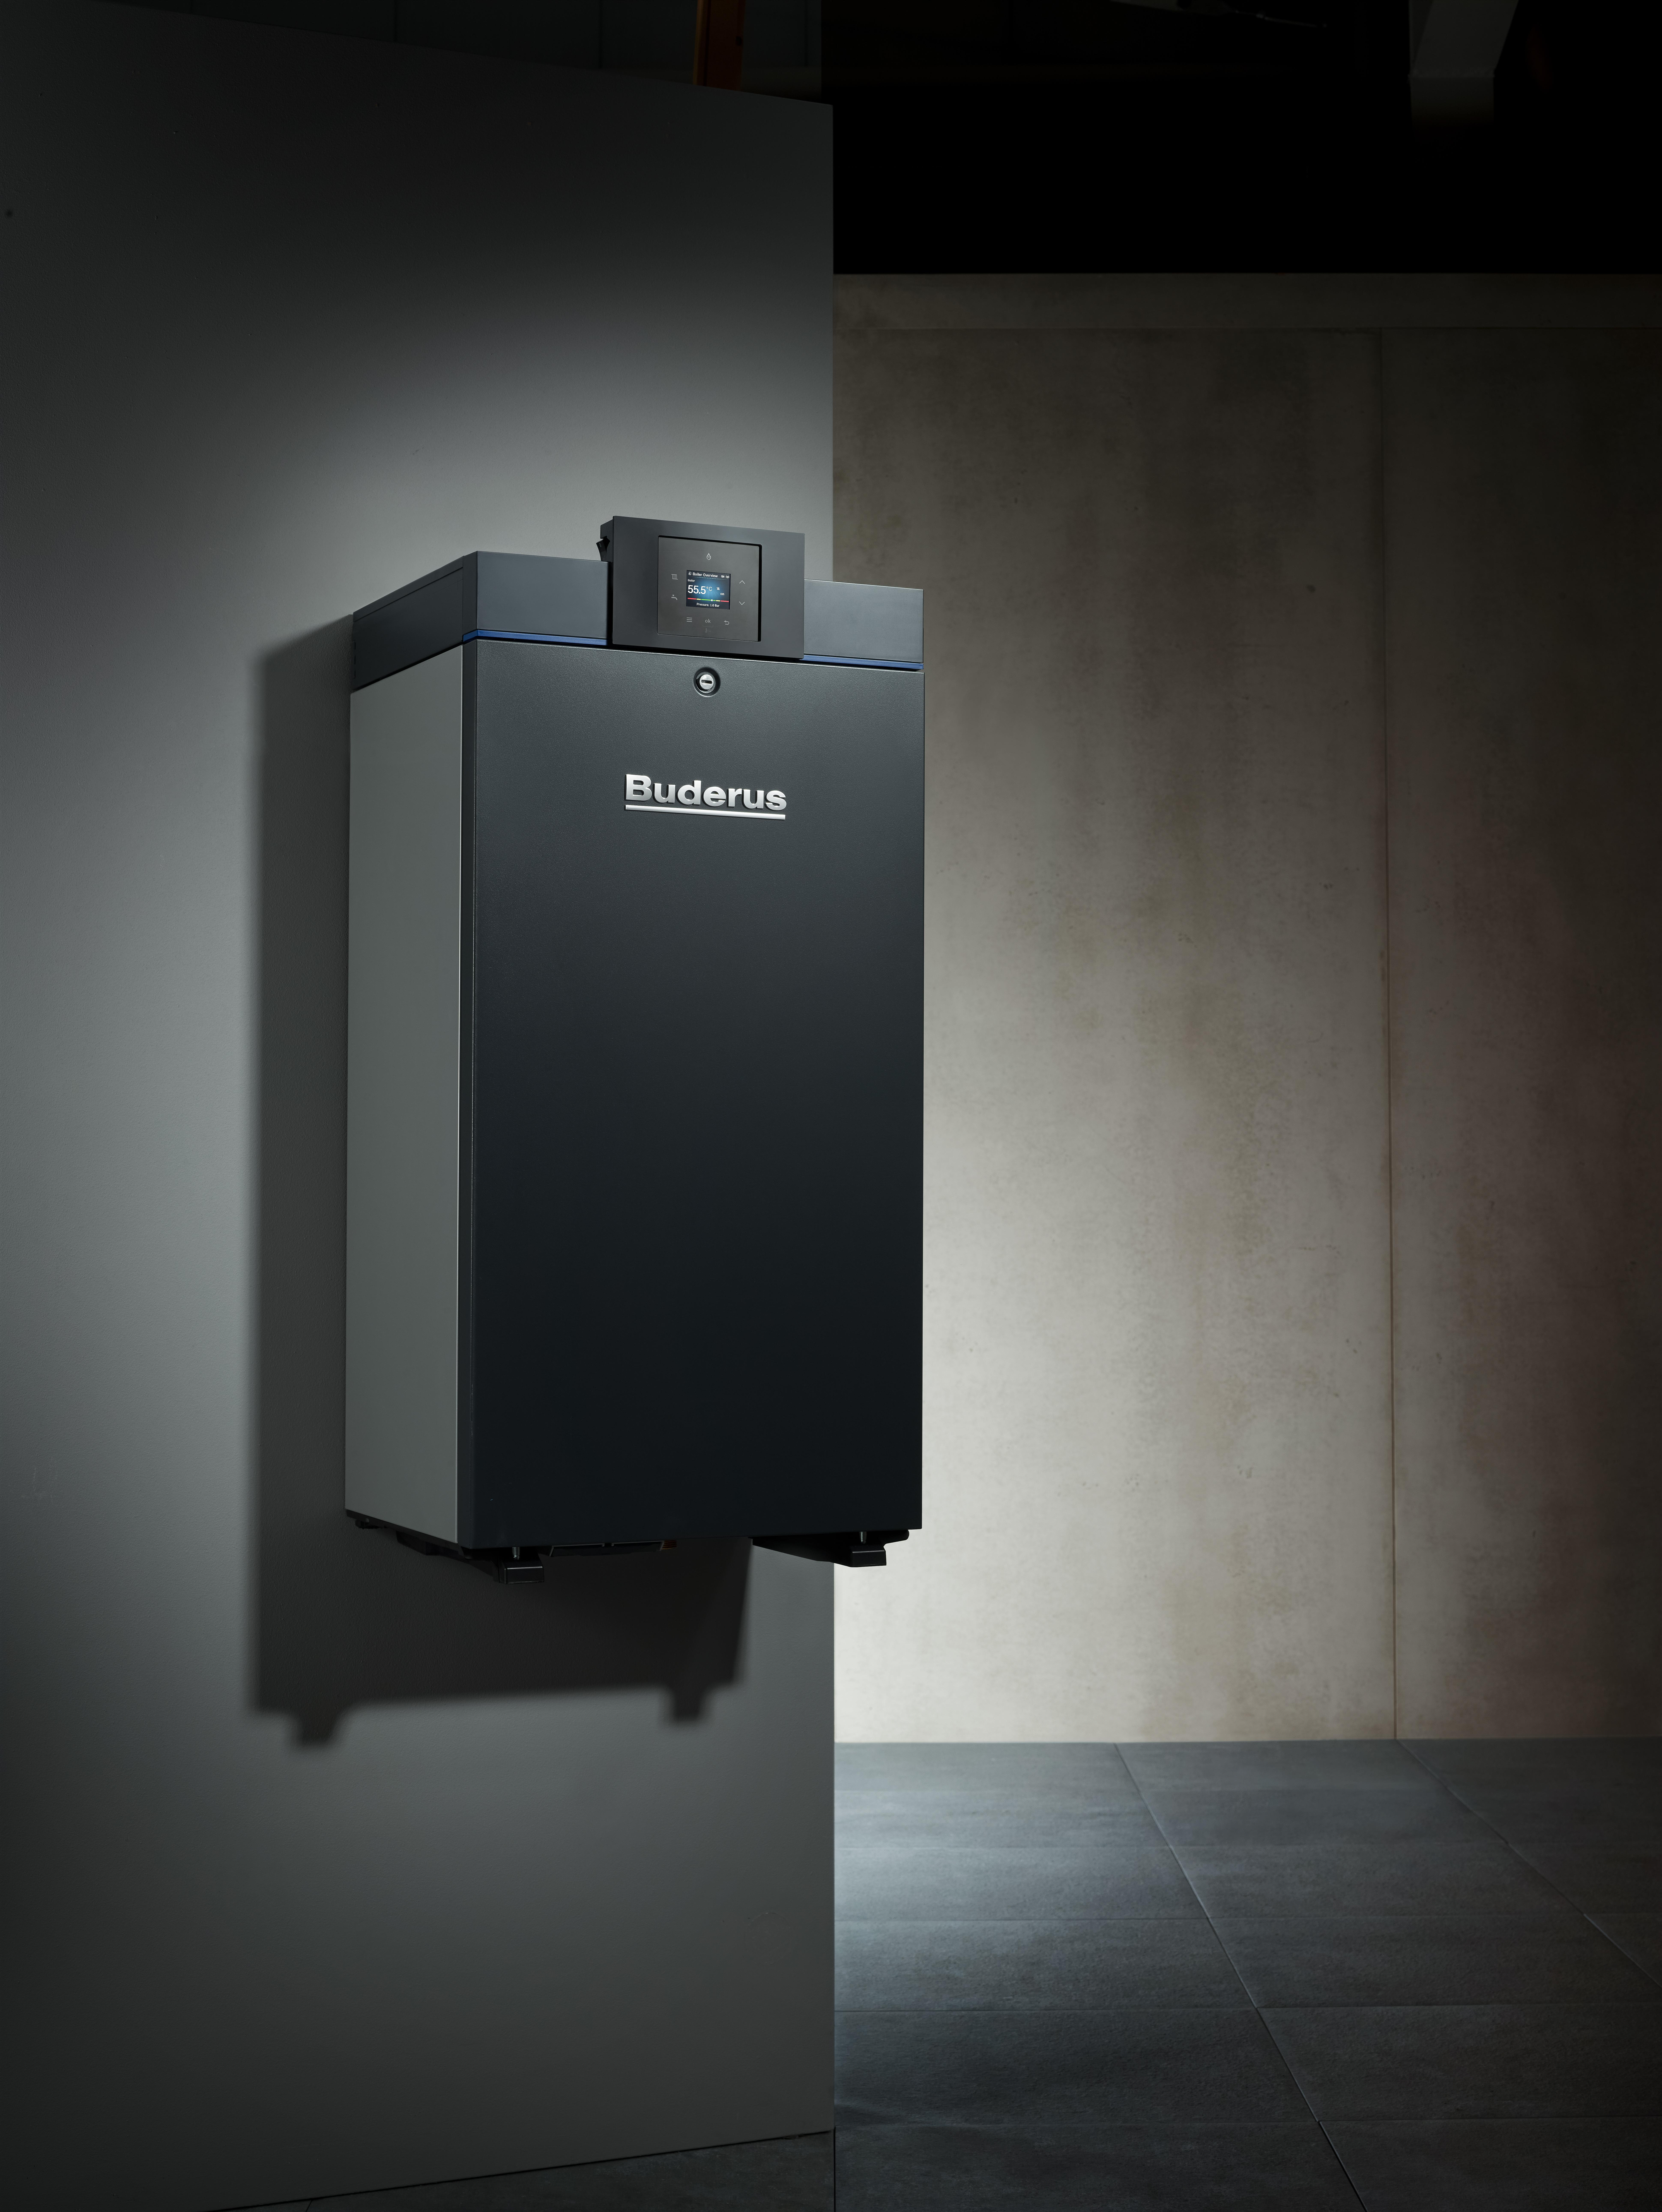 Buderus Logamax plus GB272 gas condensing boiler